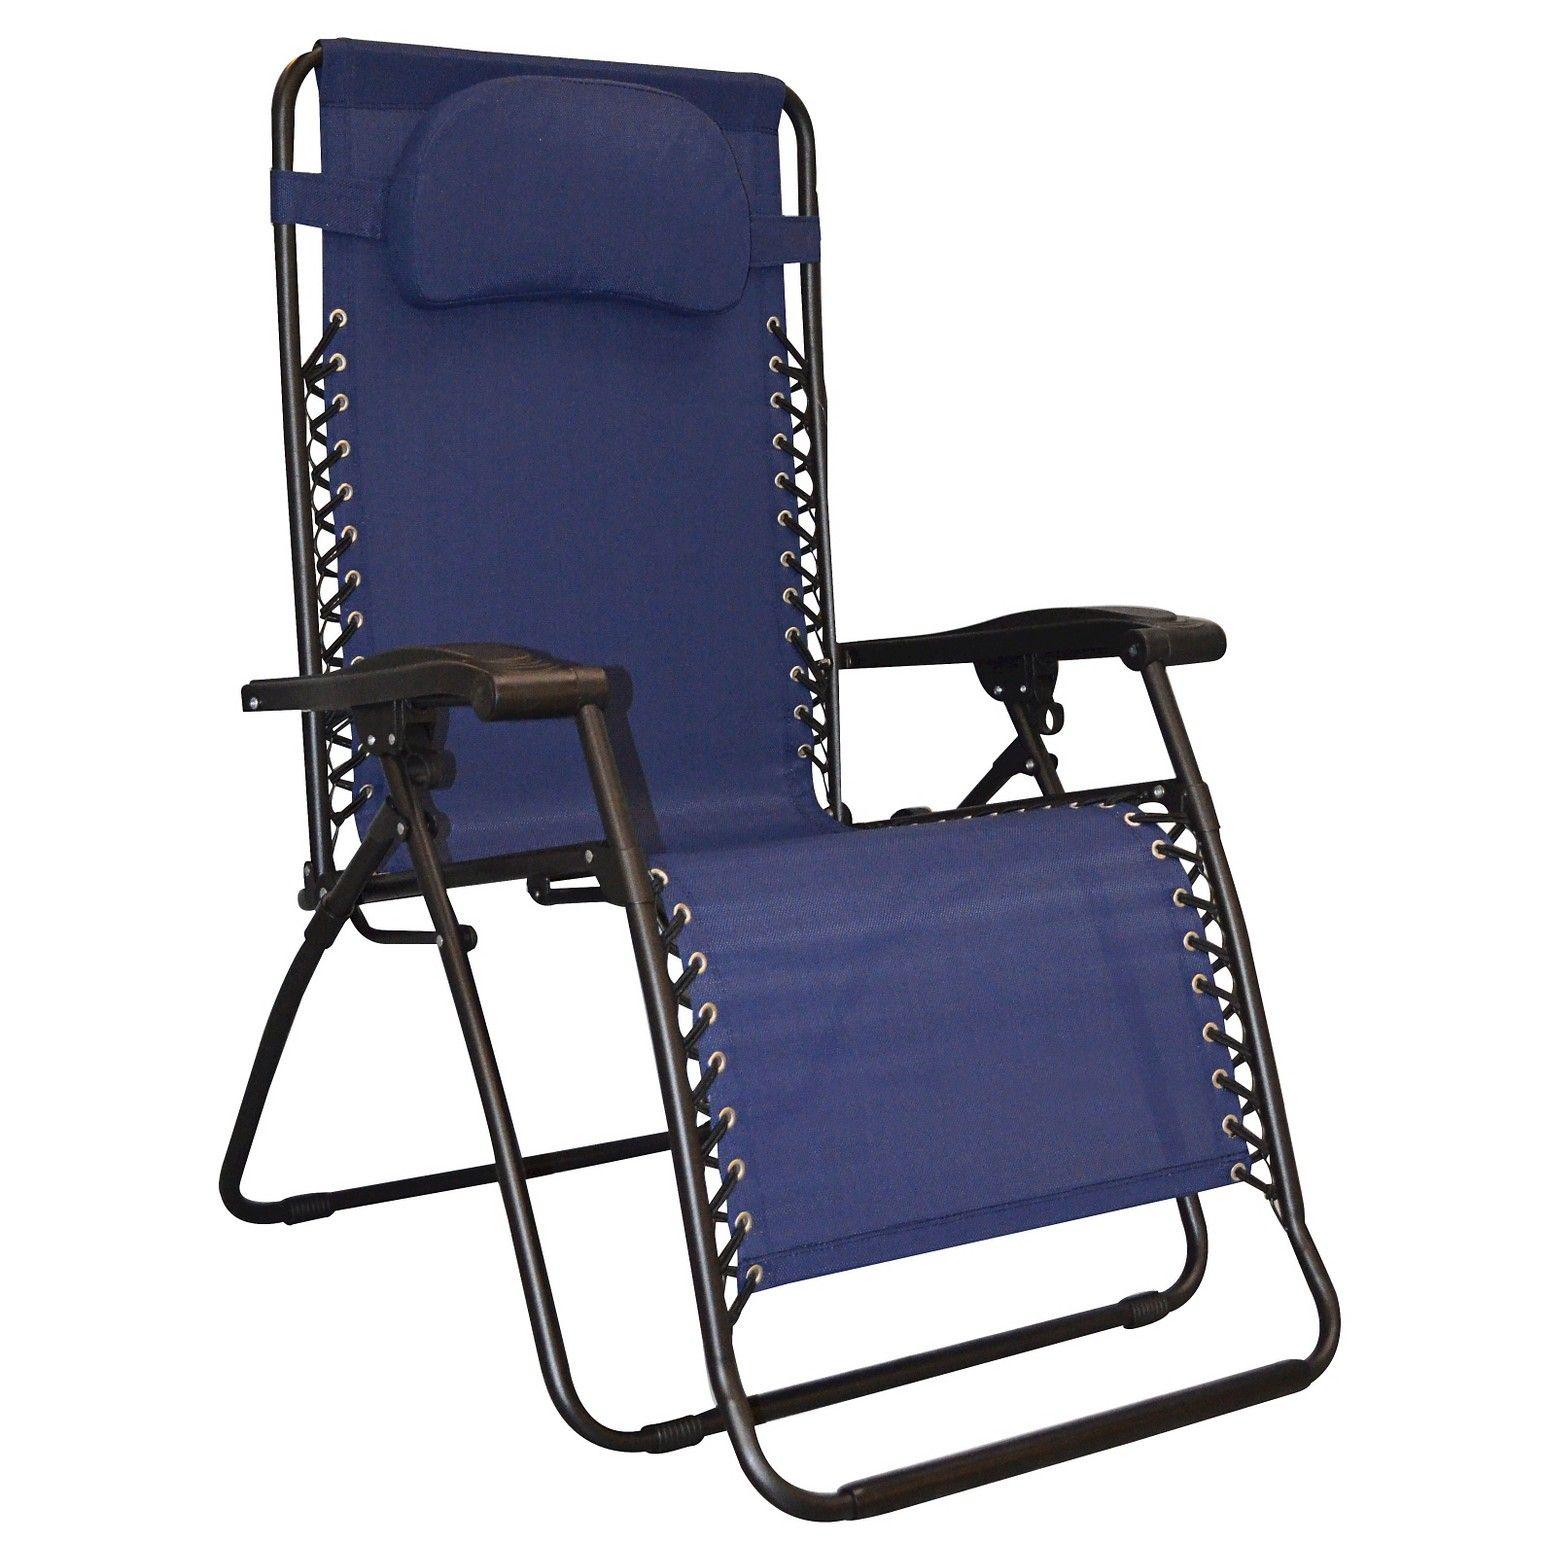 Oversized Infinity Zero Gravity Chair Caravan Zero